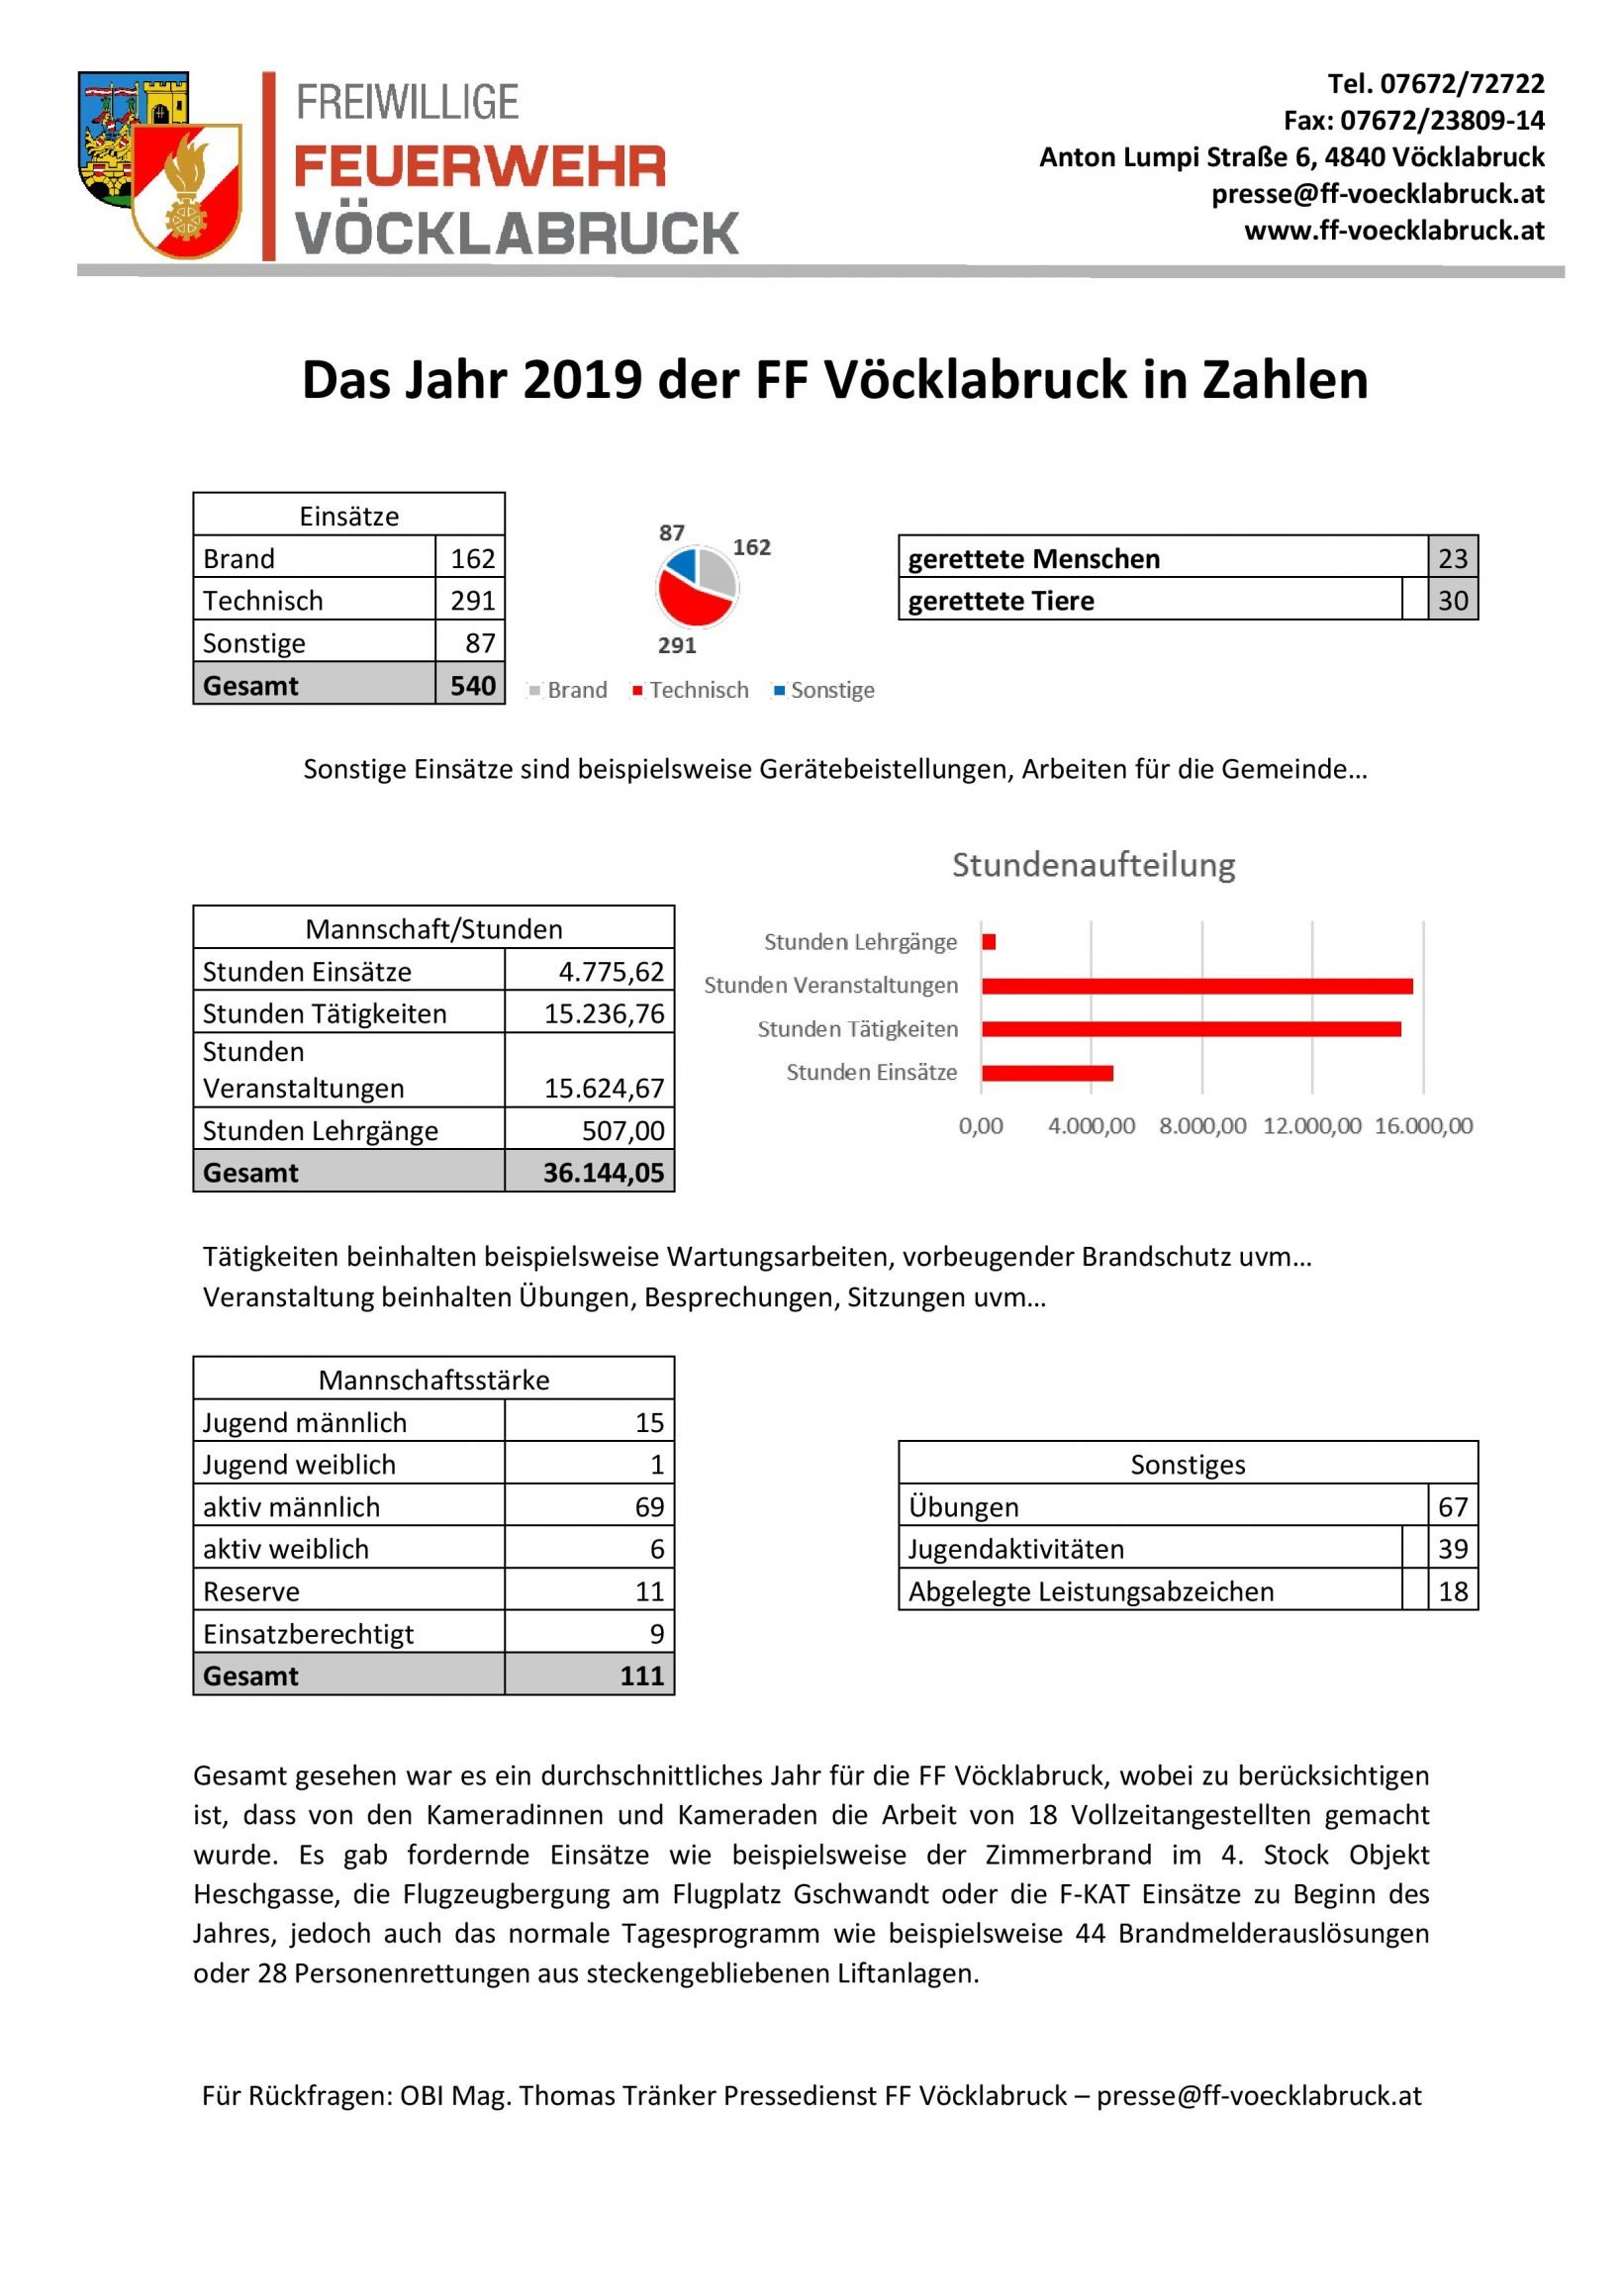 KurzjahresberichtFFVöcklabruck2019pic - Jubilarfeier 2019